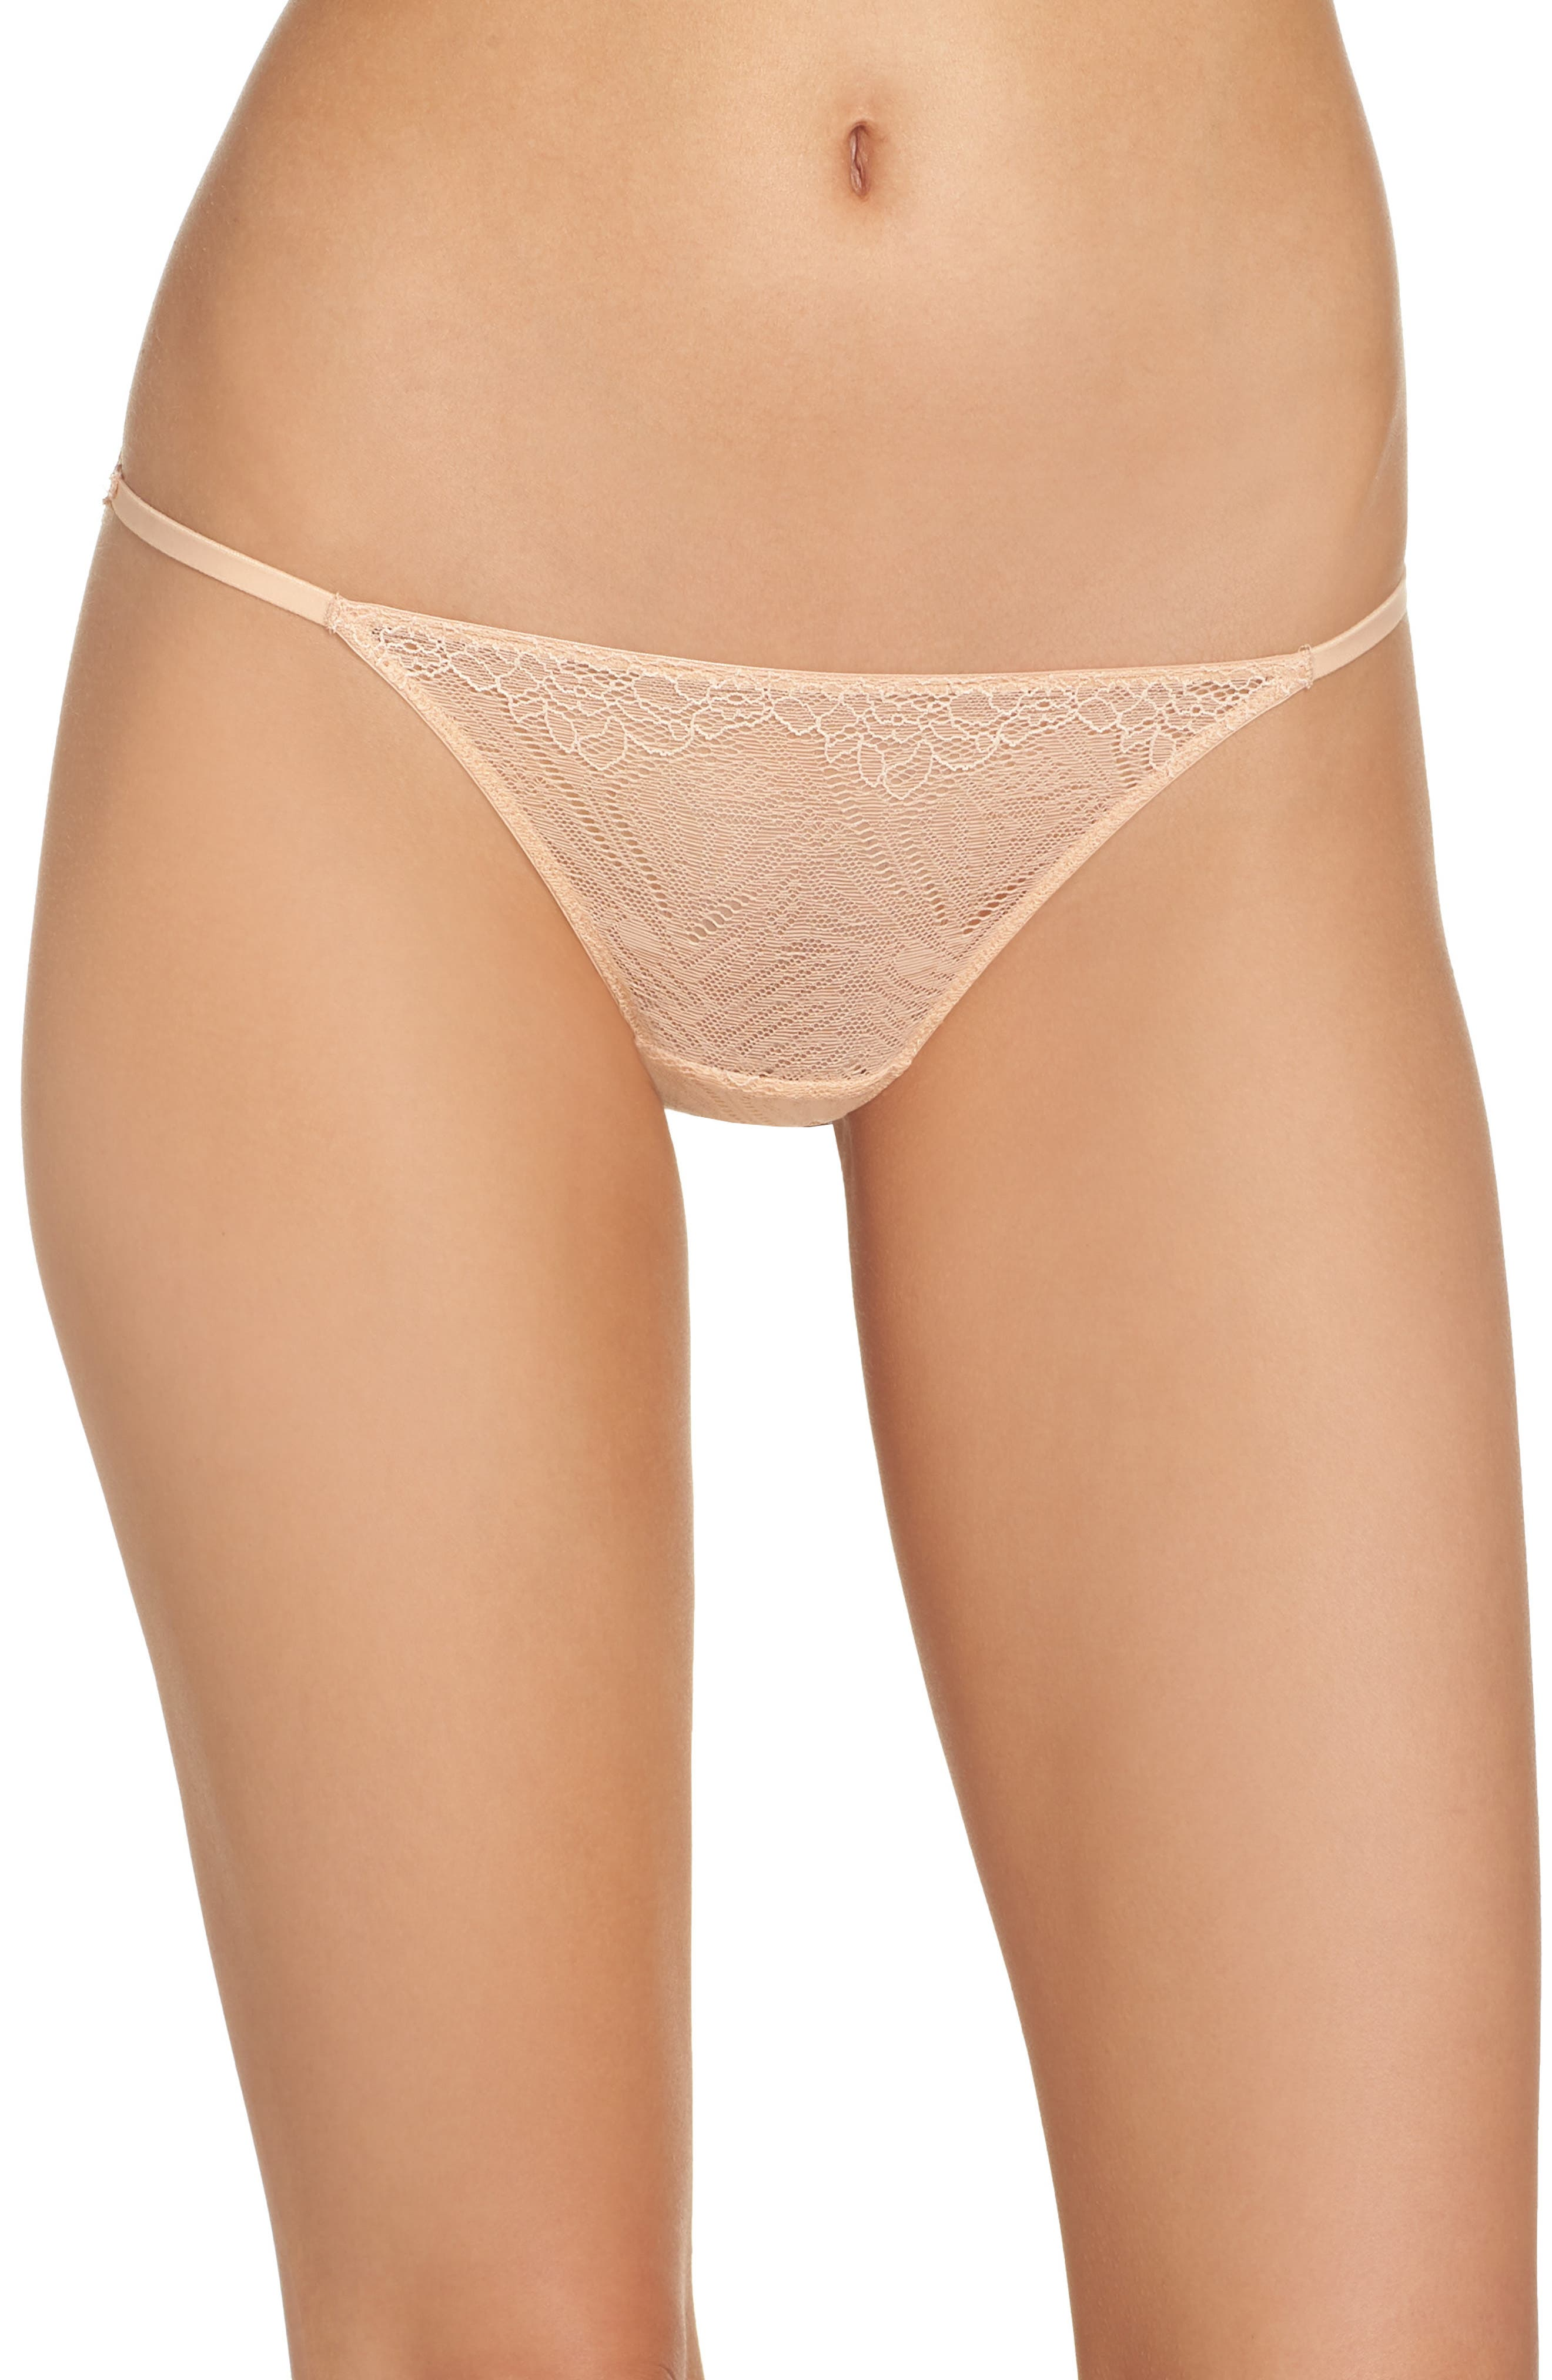 Lace String Bikini,                             Main thumbnail 1, color,                             VOILE PINK